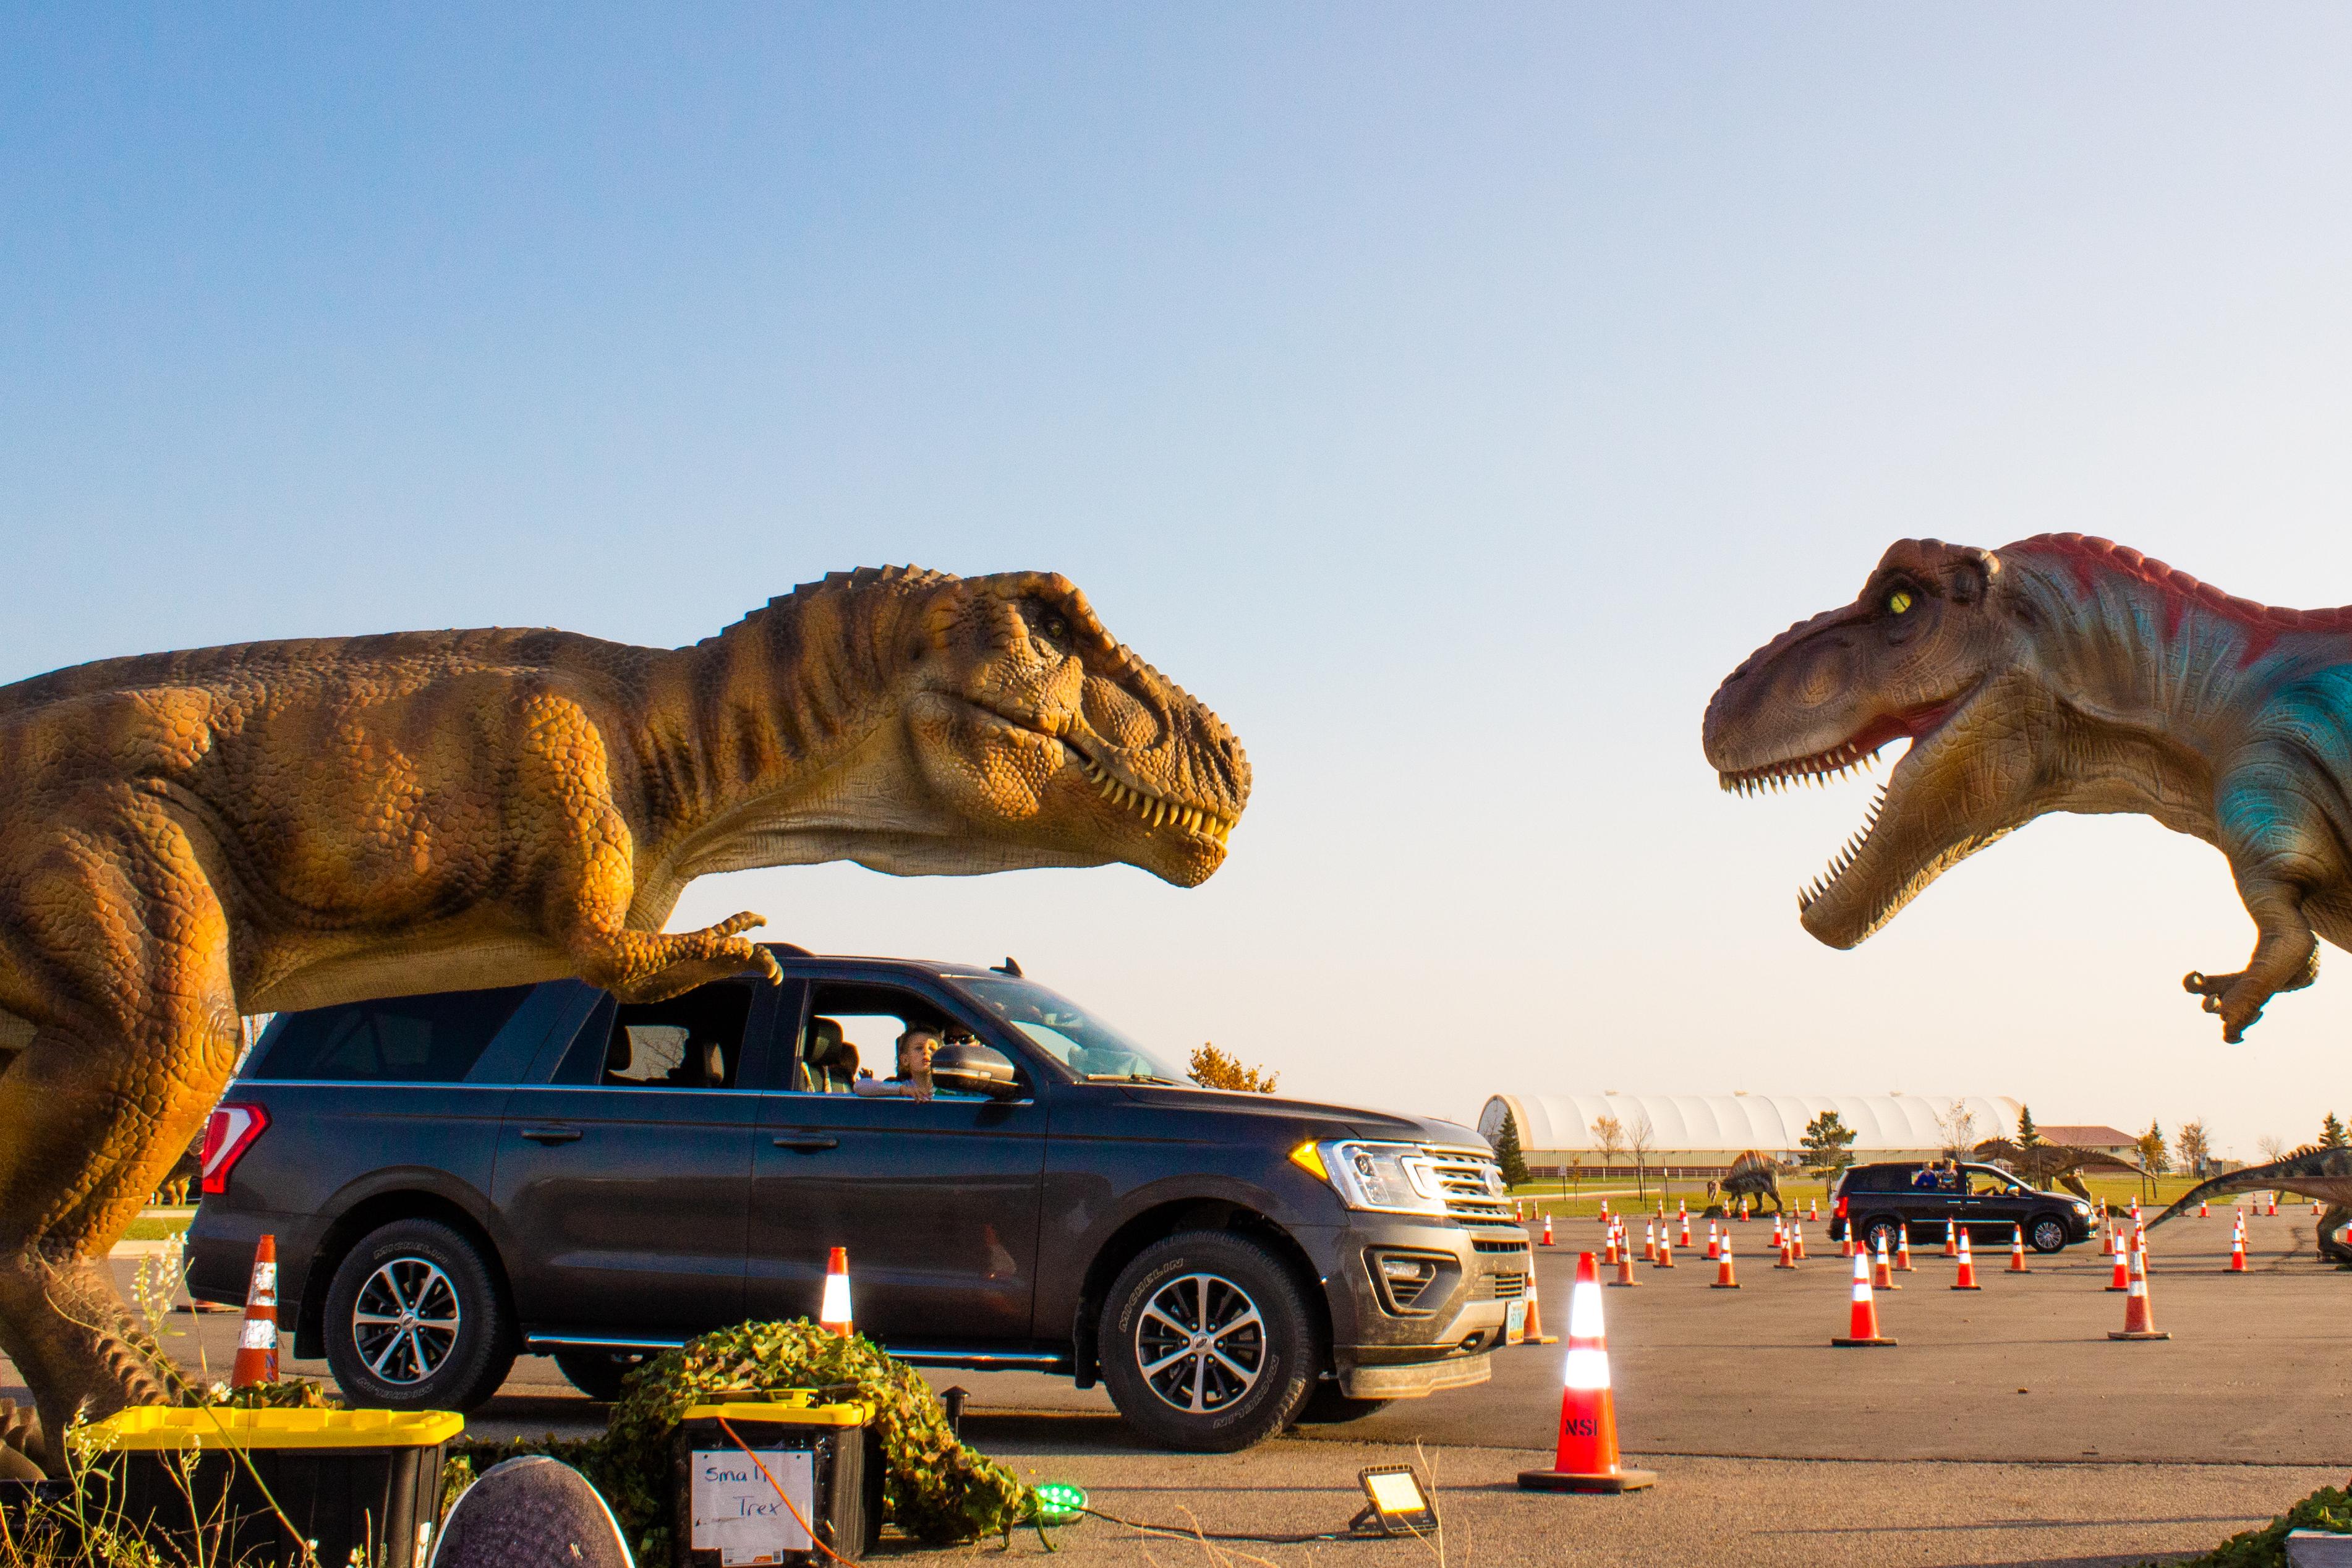 dinosaur drive through event with a van